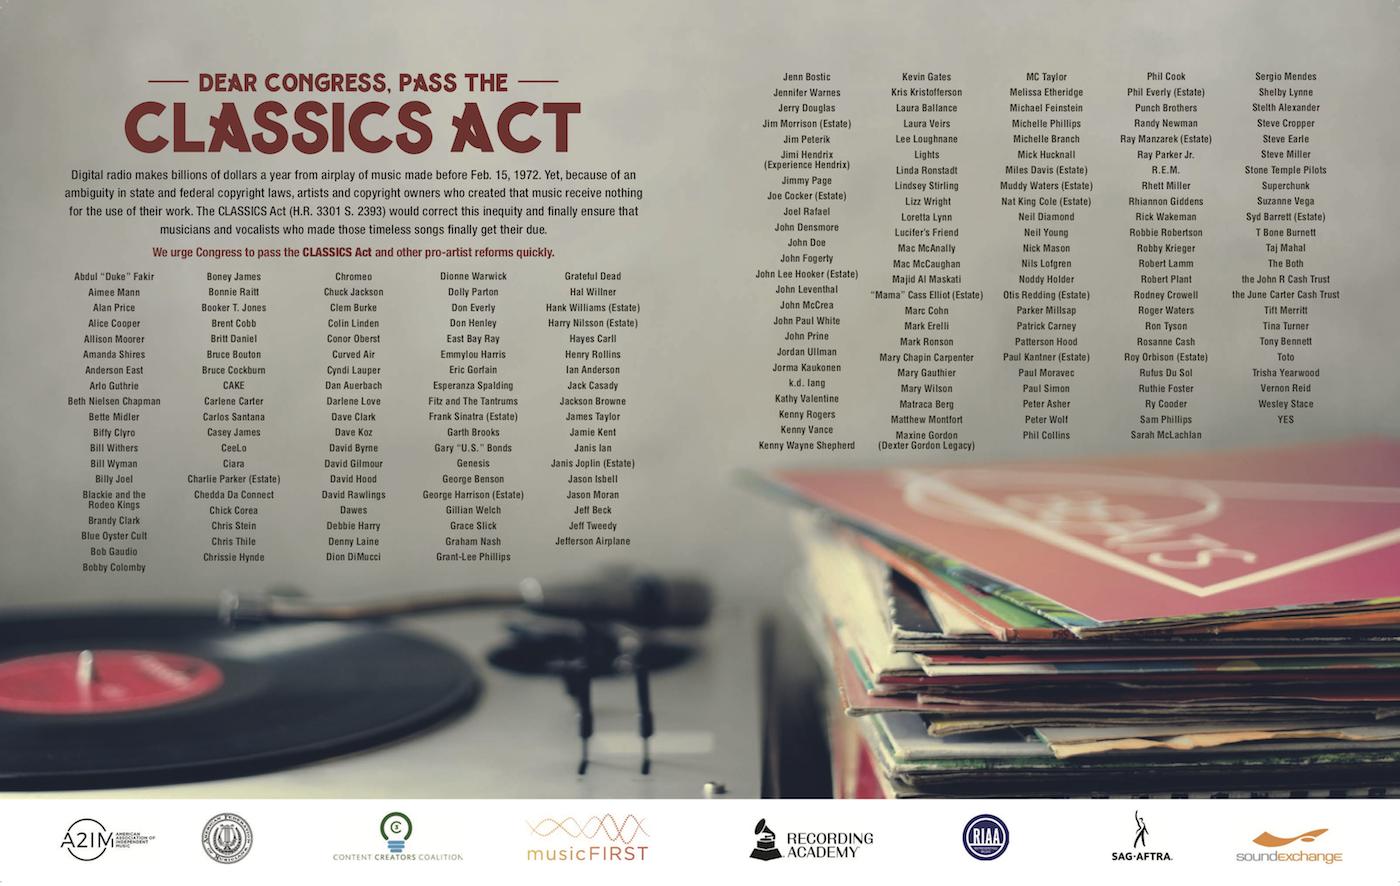 CLASSICS Ad